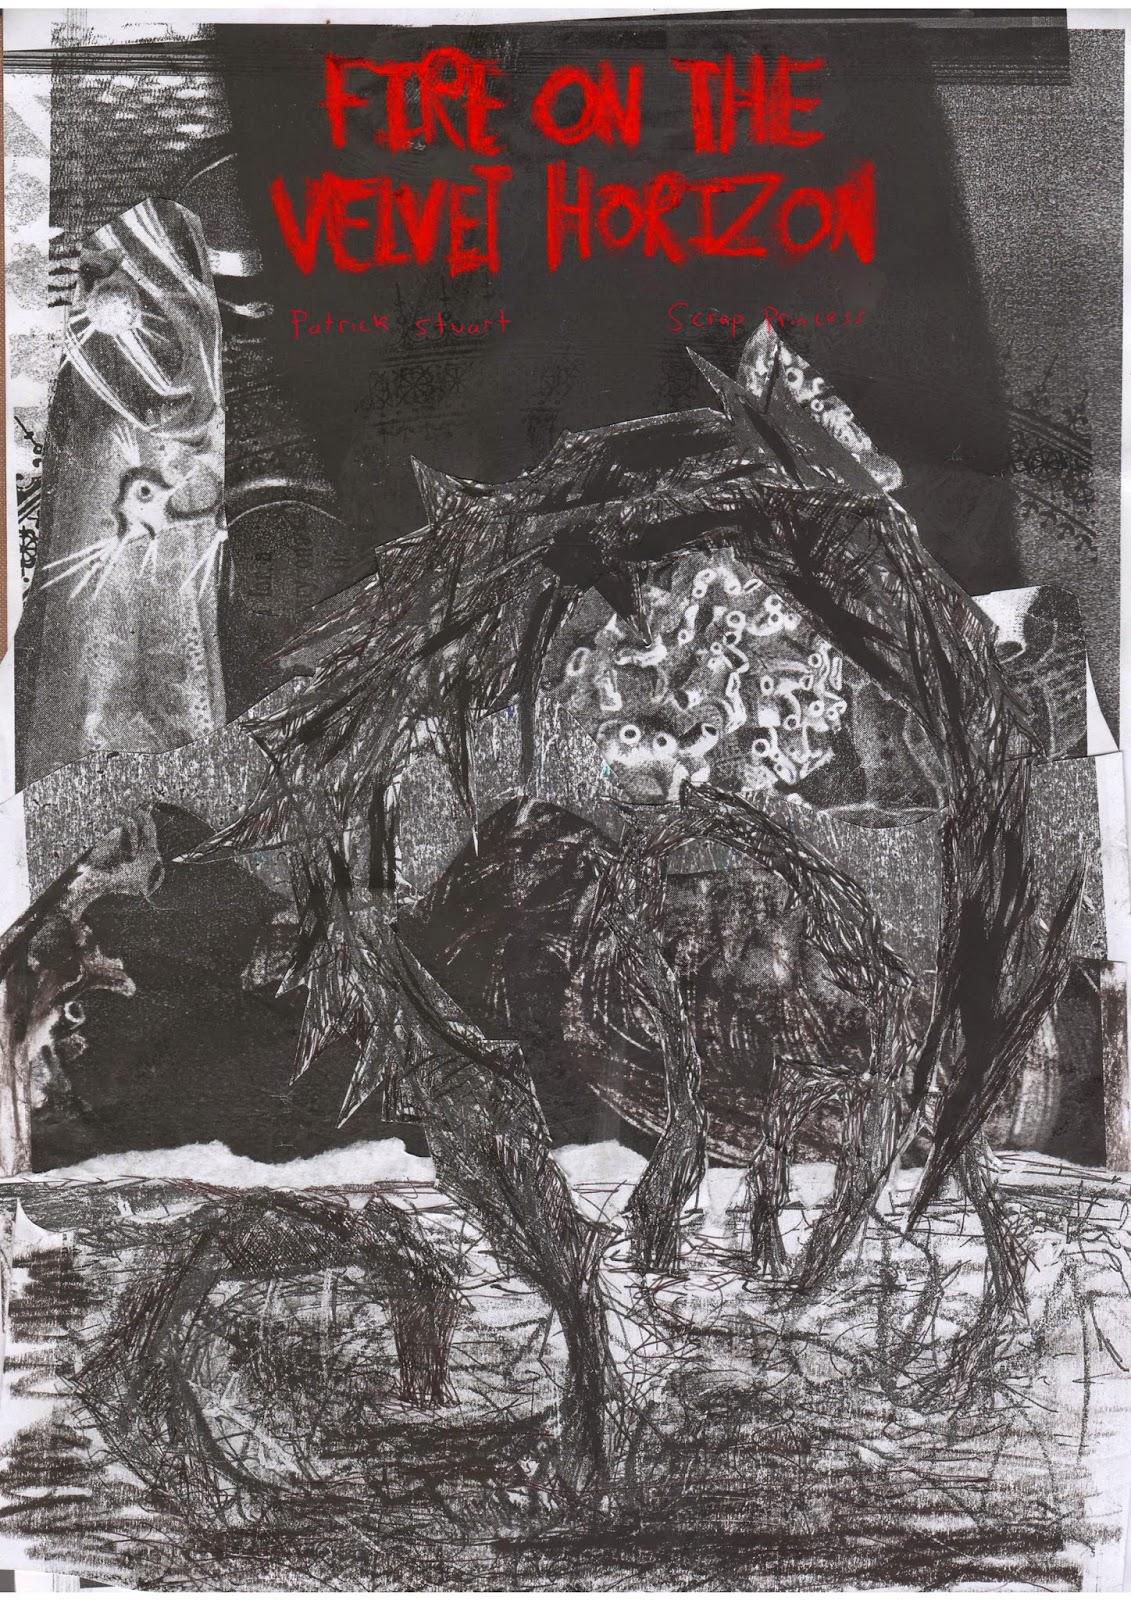 http://www.lulu.com/shop/scrap-princess-and-patrick-stuart/fire-on-the-velvet-horizon/paperback/product-22076186.html